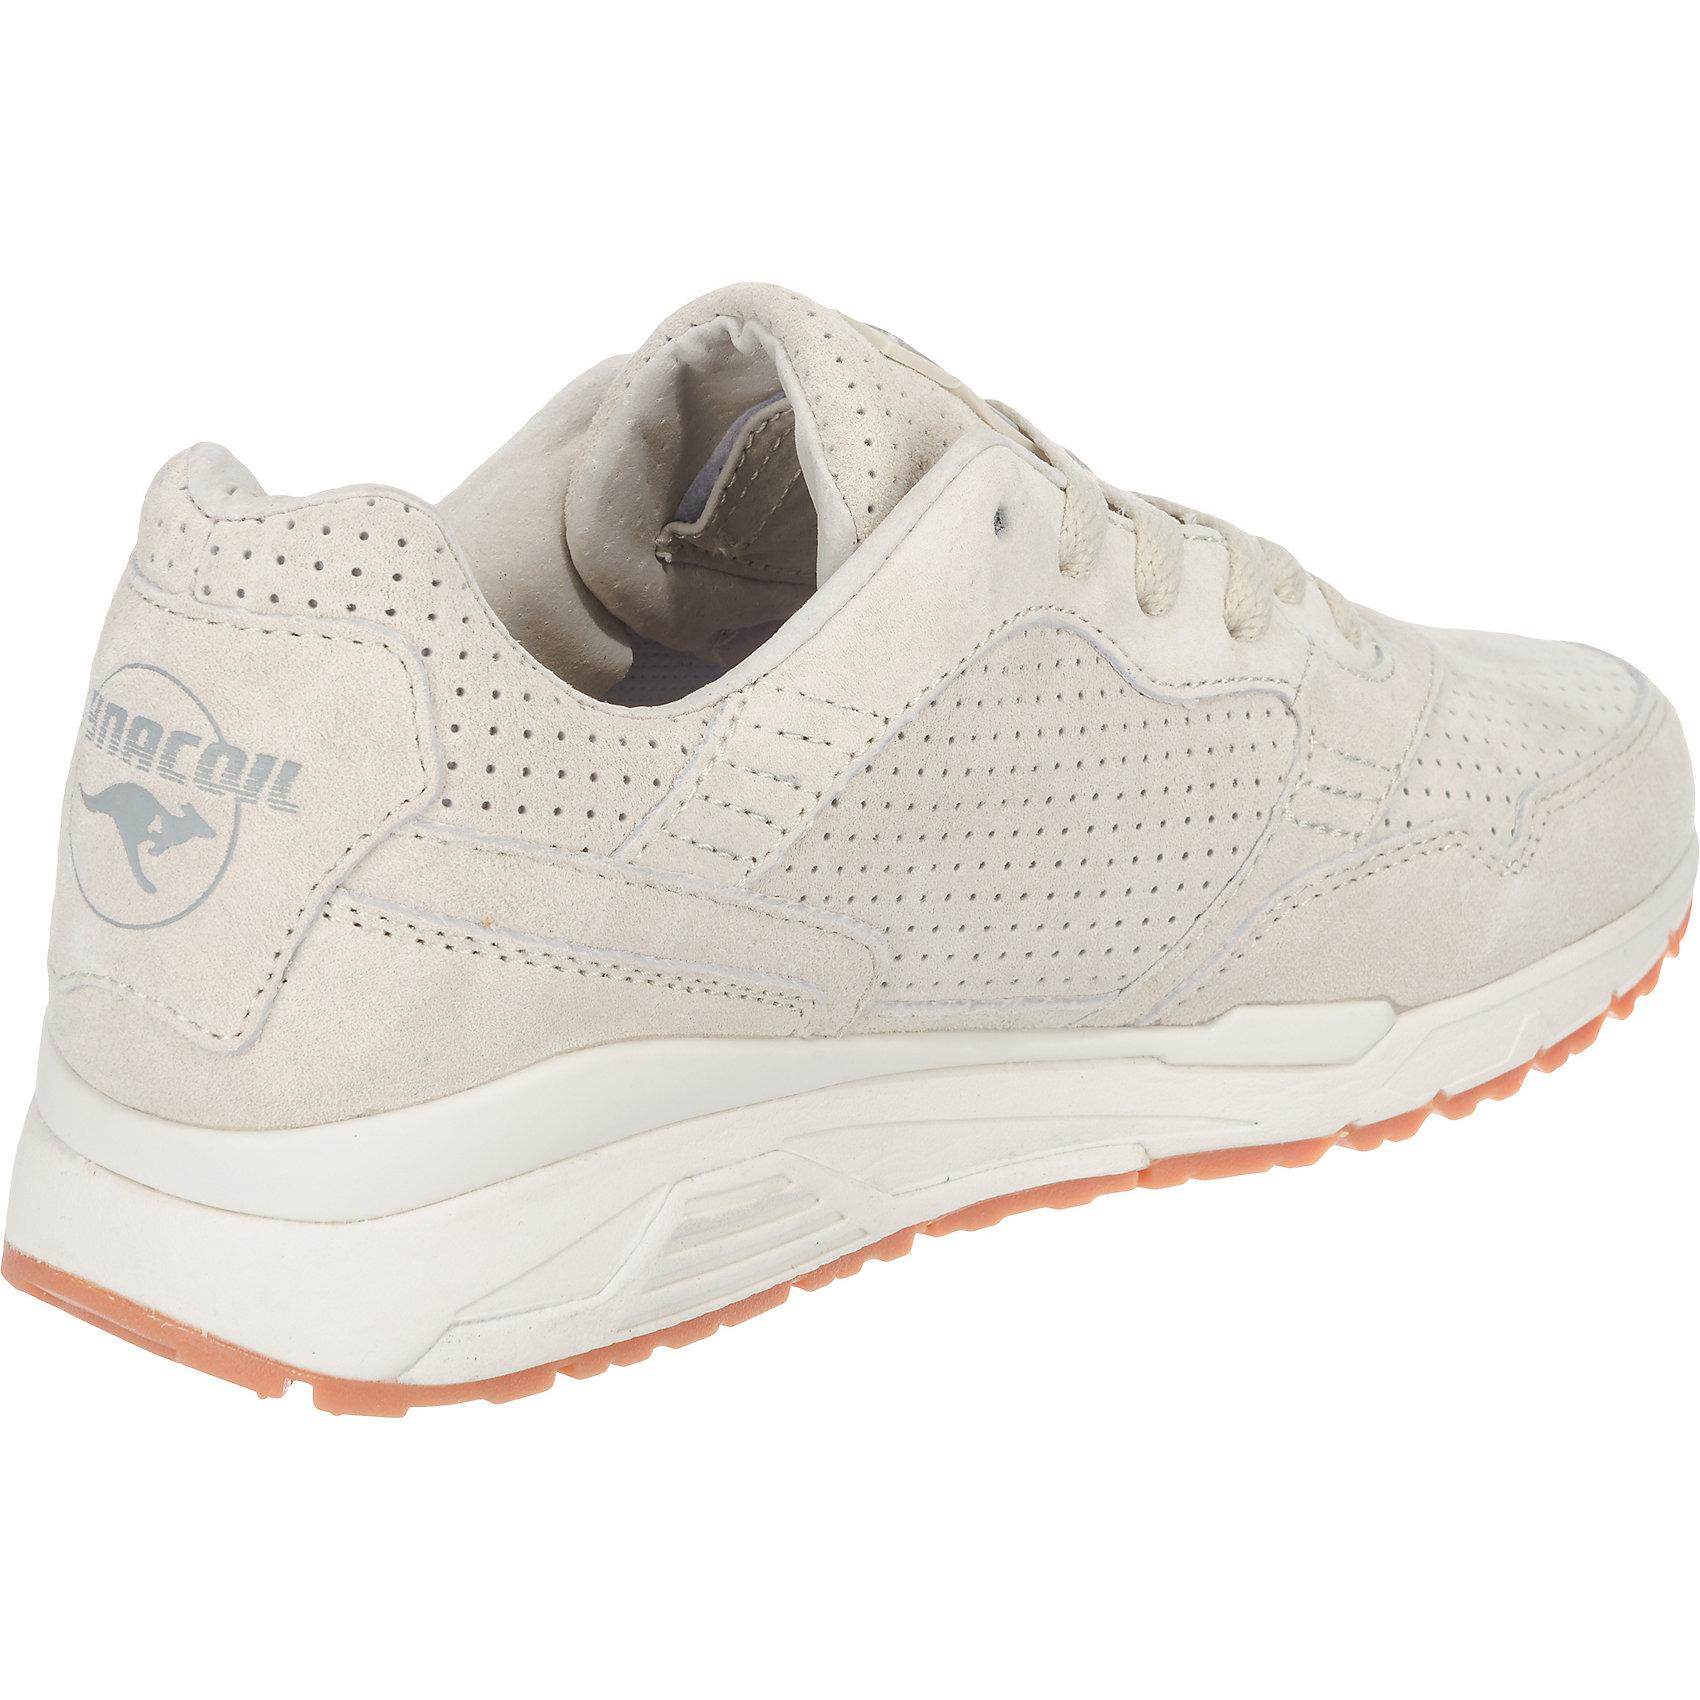 Neu KangaROOS Ultimate Sneakers 5775545 offwhite